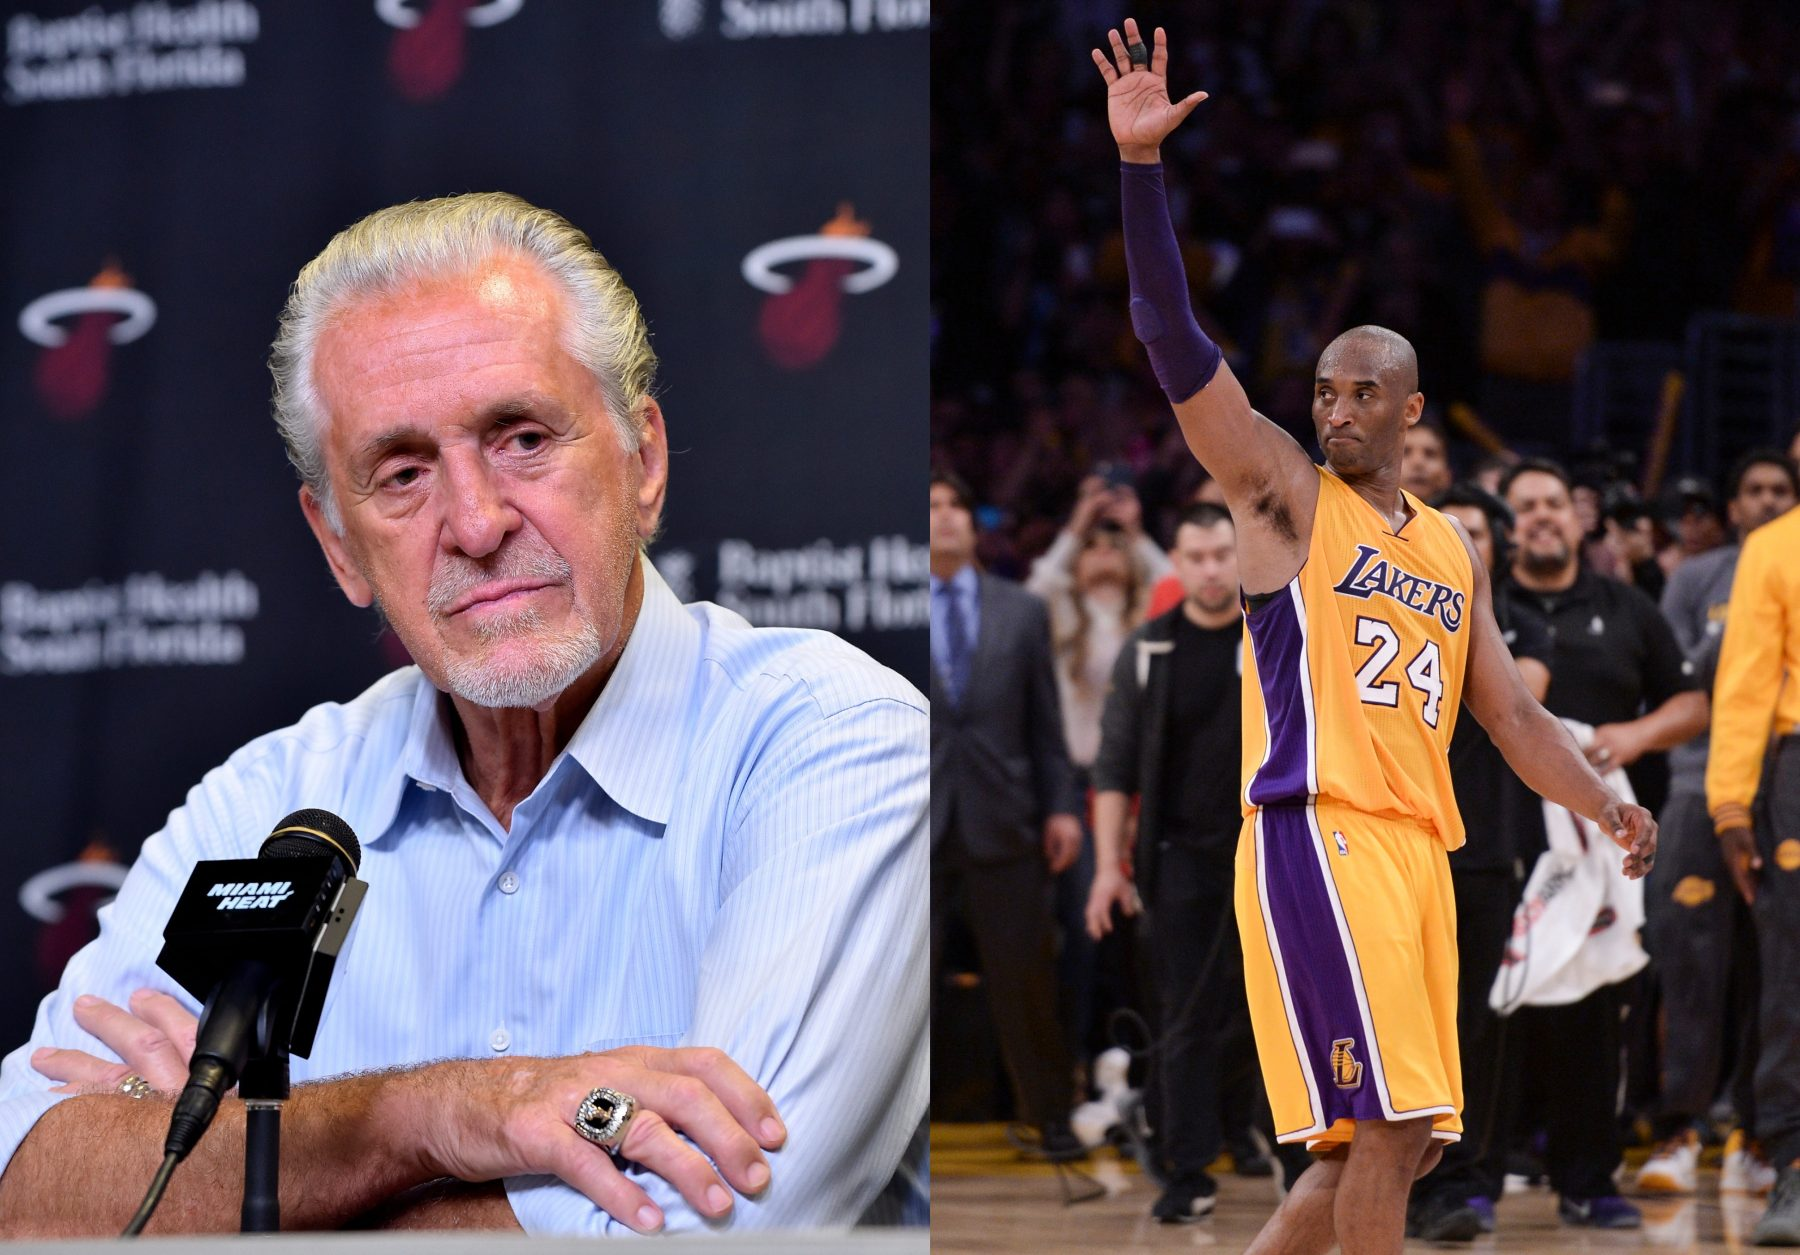 Pat Riley and Kobe Bryant